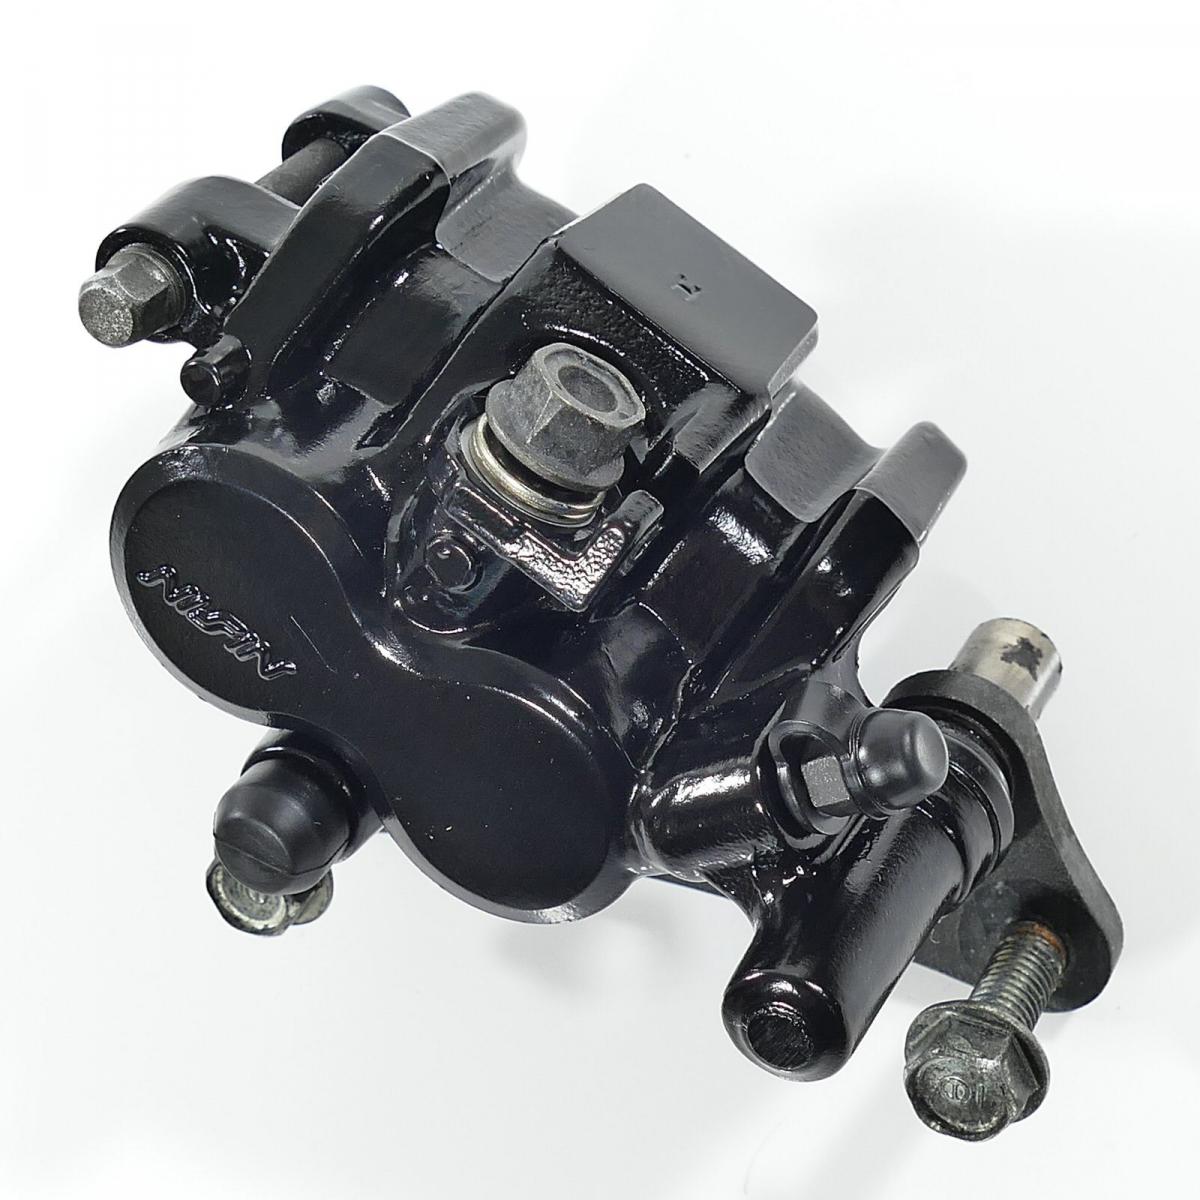 honda cbr125 cbr125r jc50 bremssattel bremszange bn bikes. Black Bedroom Furniture Sets. Home Design Ideas